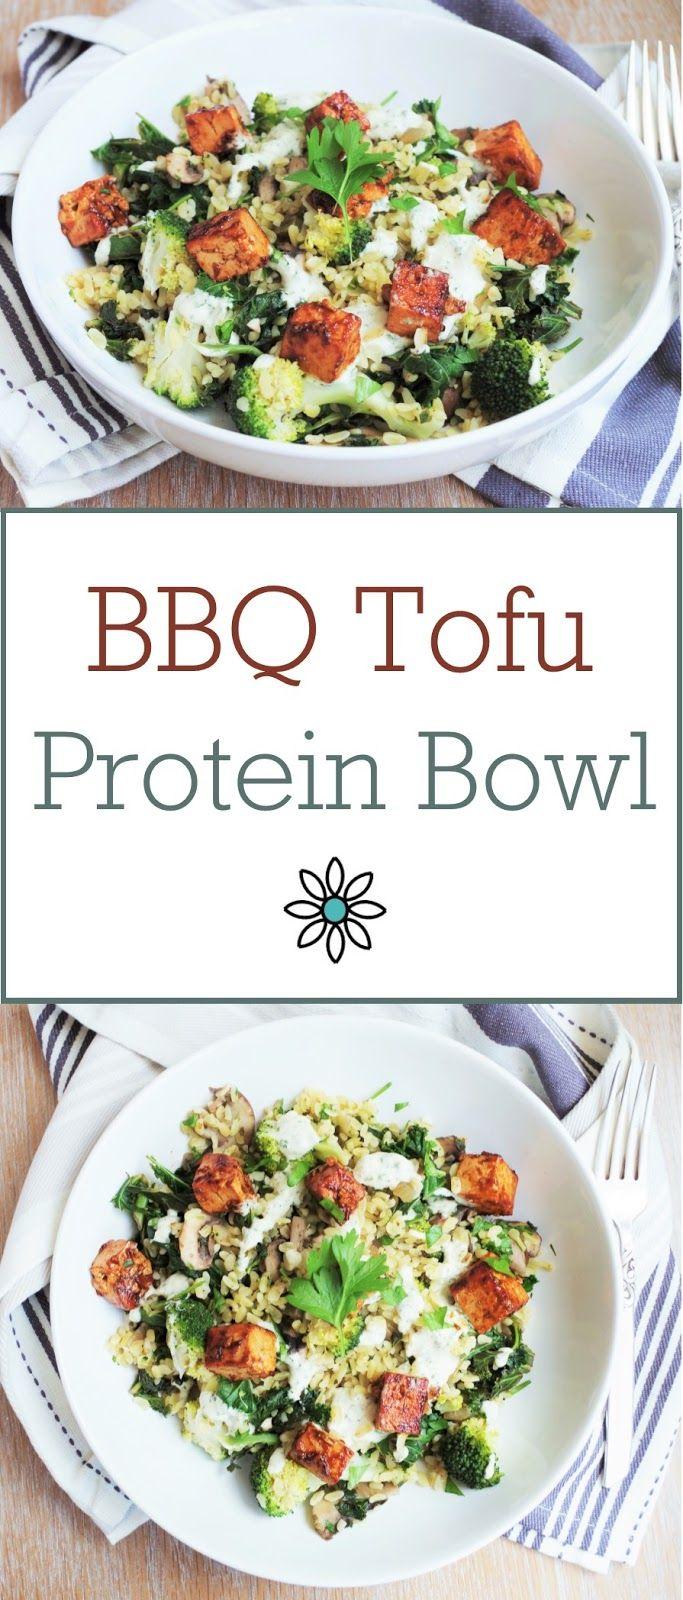 BBQ Tofu Protein Bowl |Euphoric Vegan